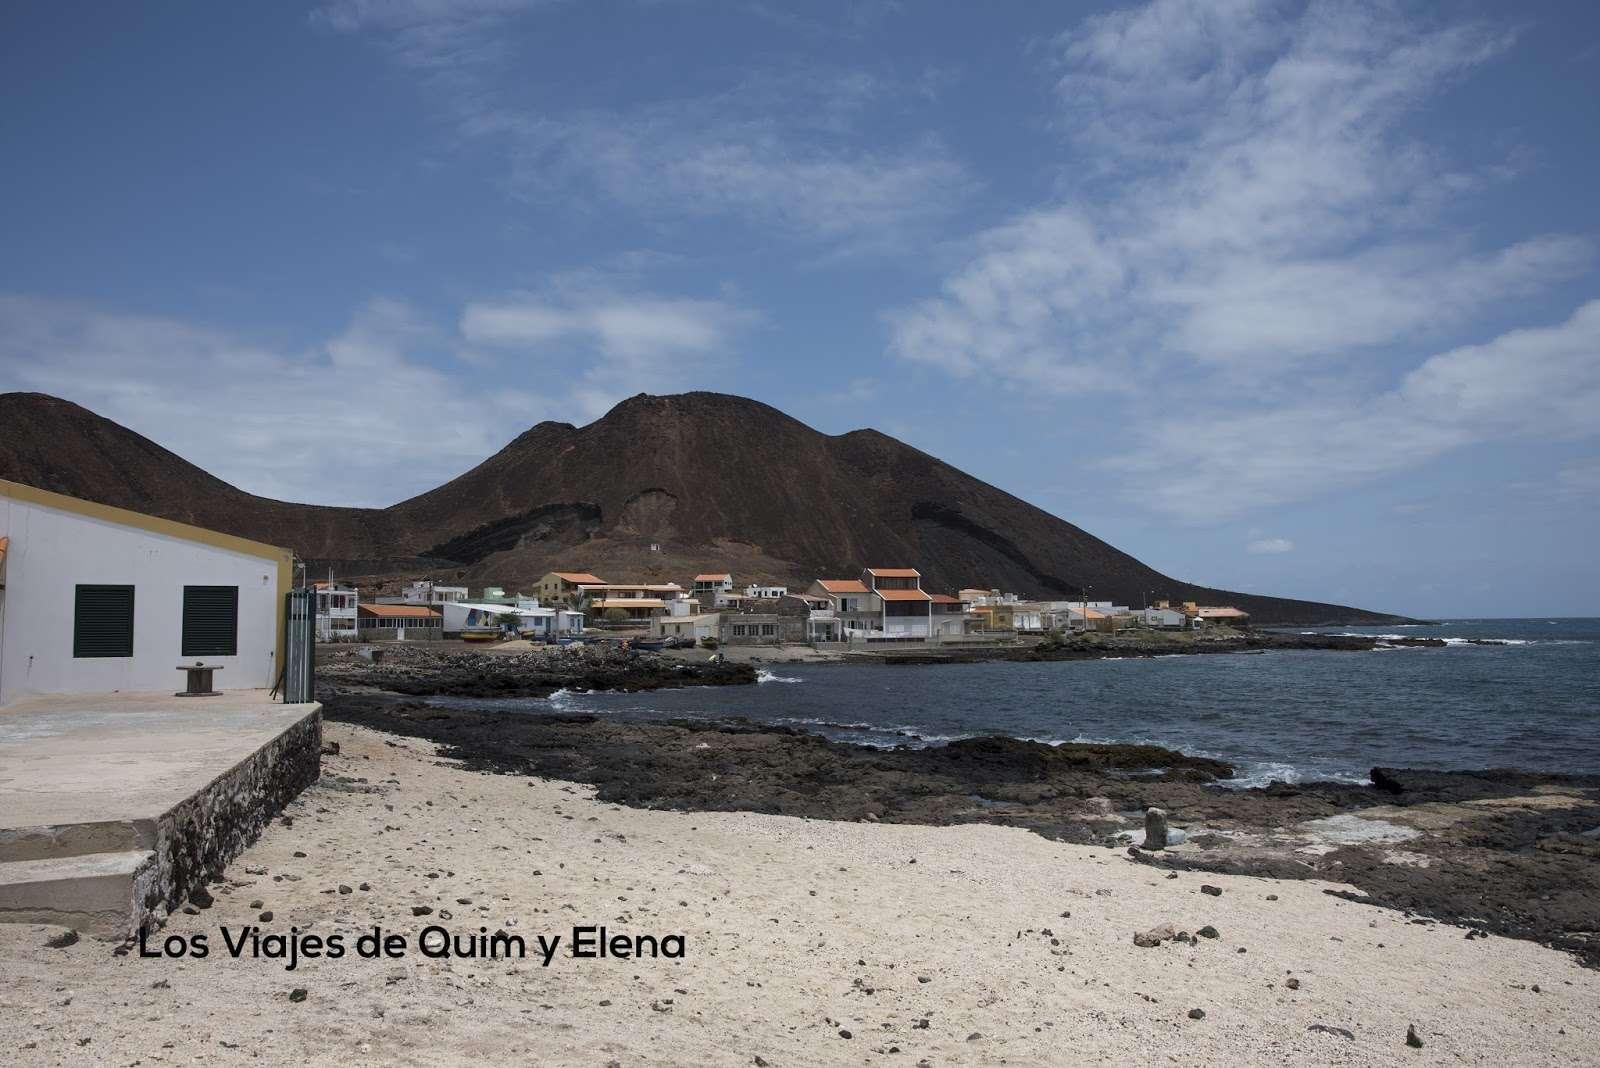 Vuelta a Sao Vicente. Mindelo y Calhau (Cabo Verde)